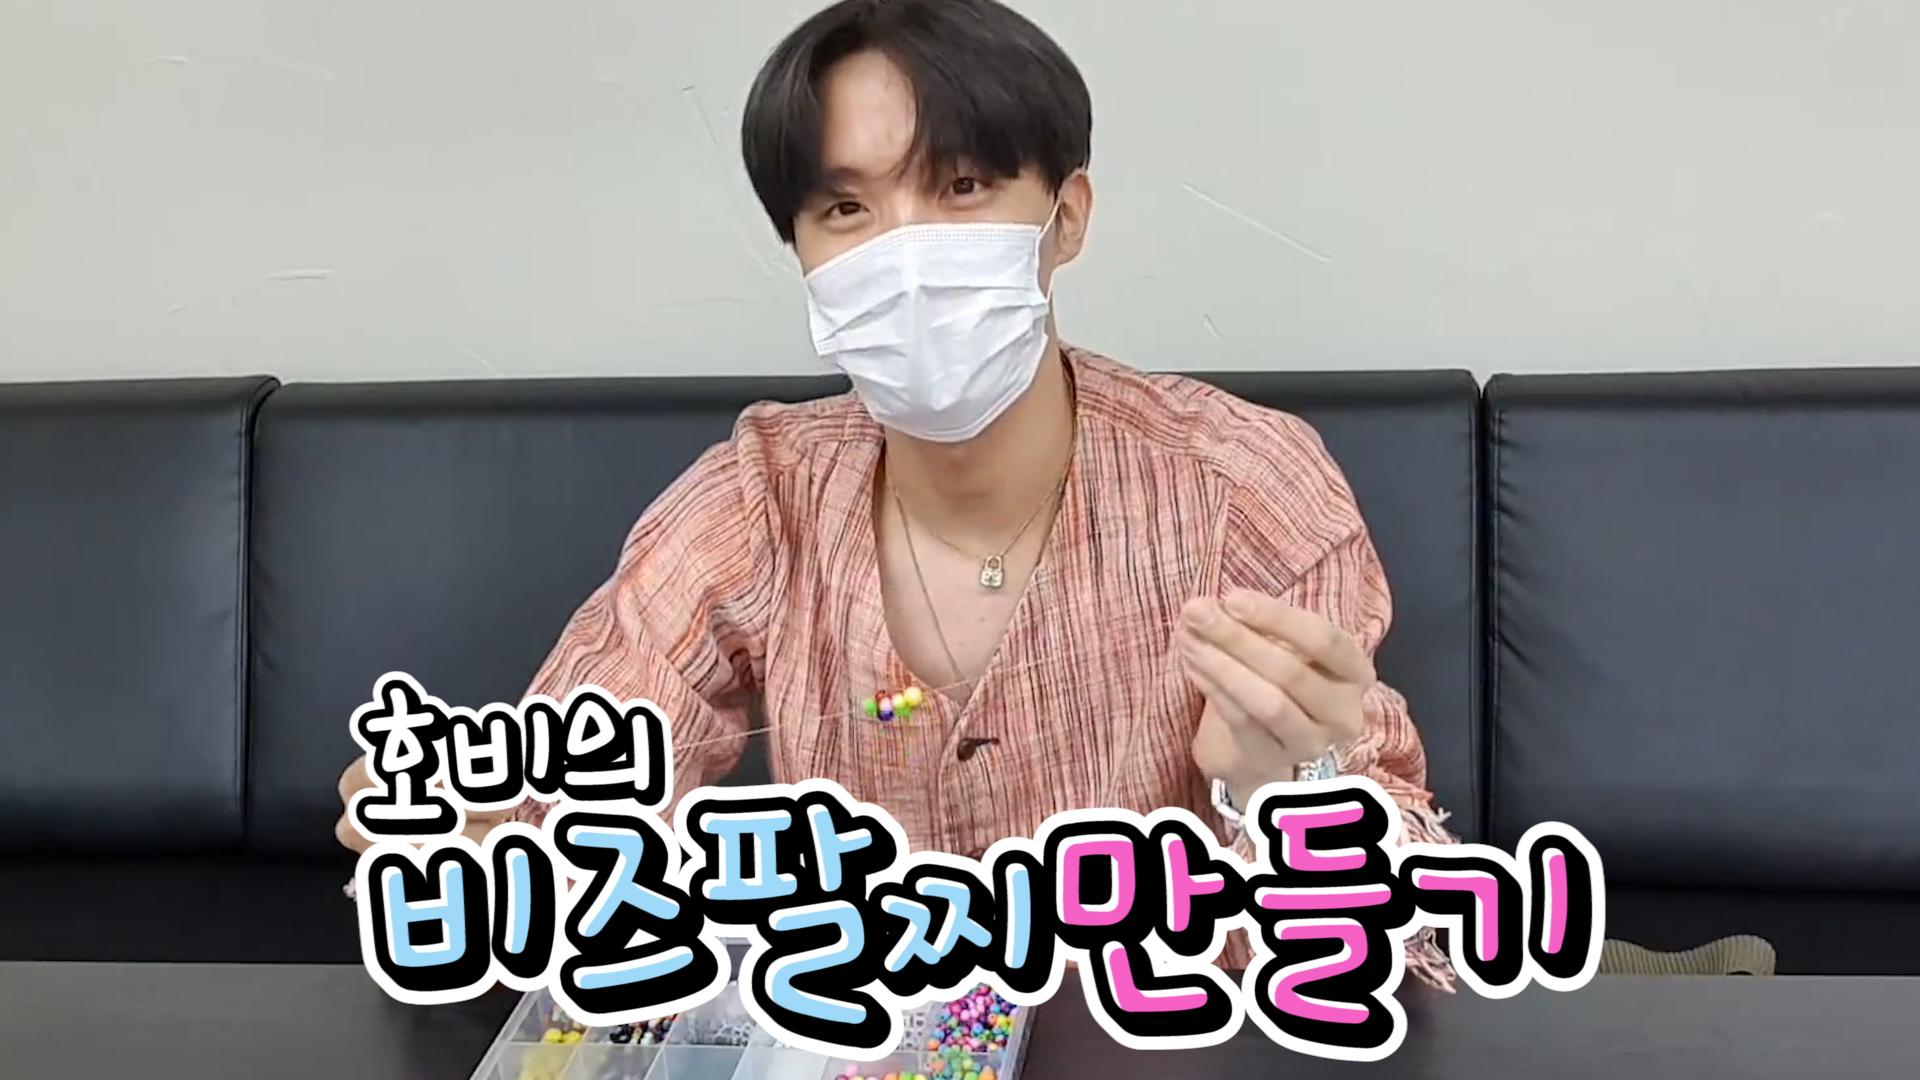 [BTS] 비즈팔찌 만드는 대롬쥐를 위해 행성으로 쥬얼리세트를!!!!!!!💍 (J-HOPE making beads bracelet)